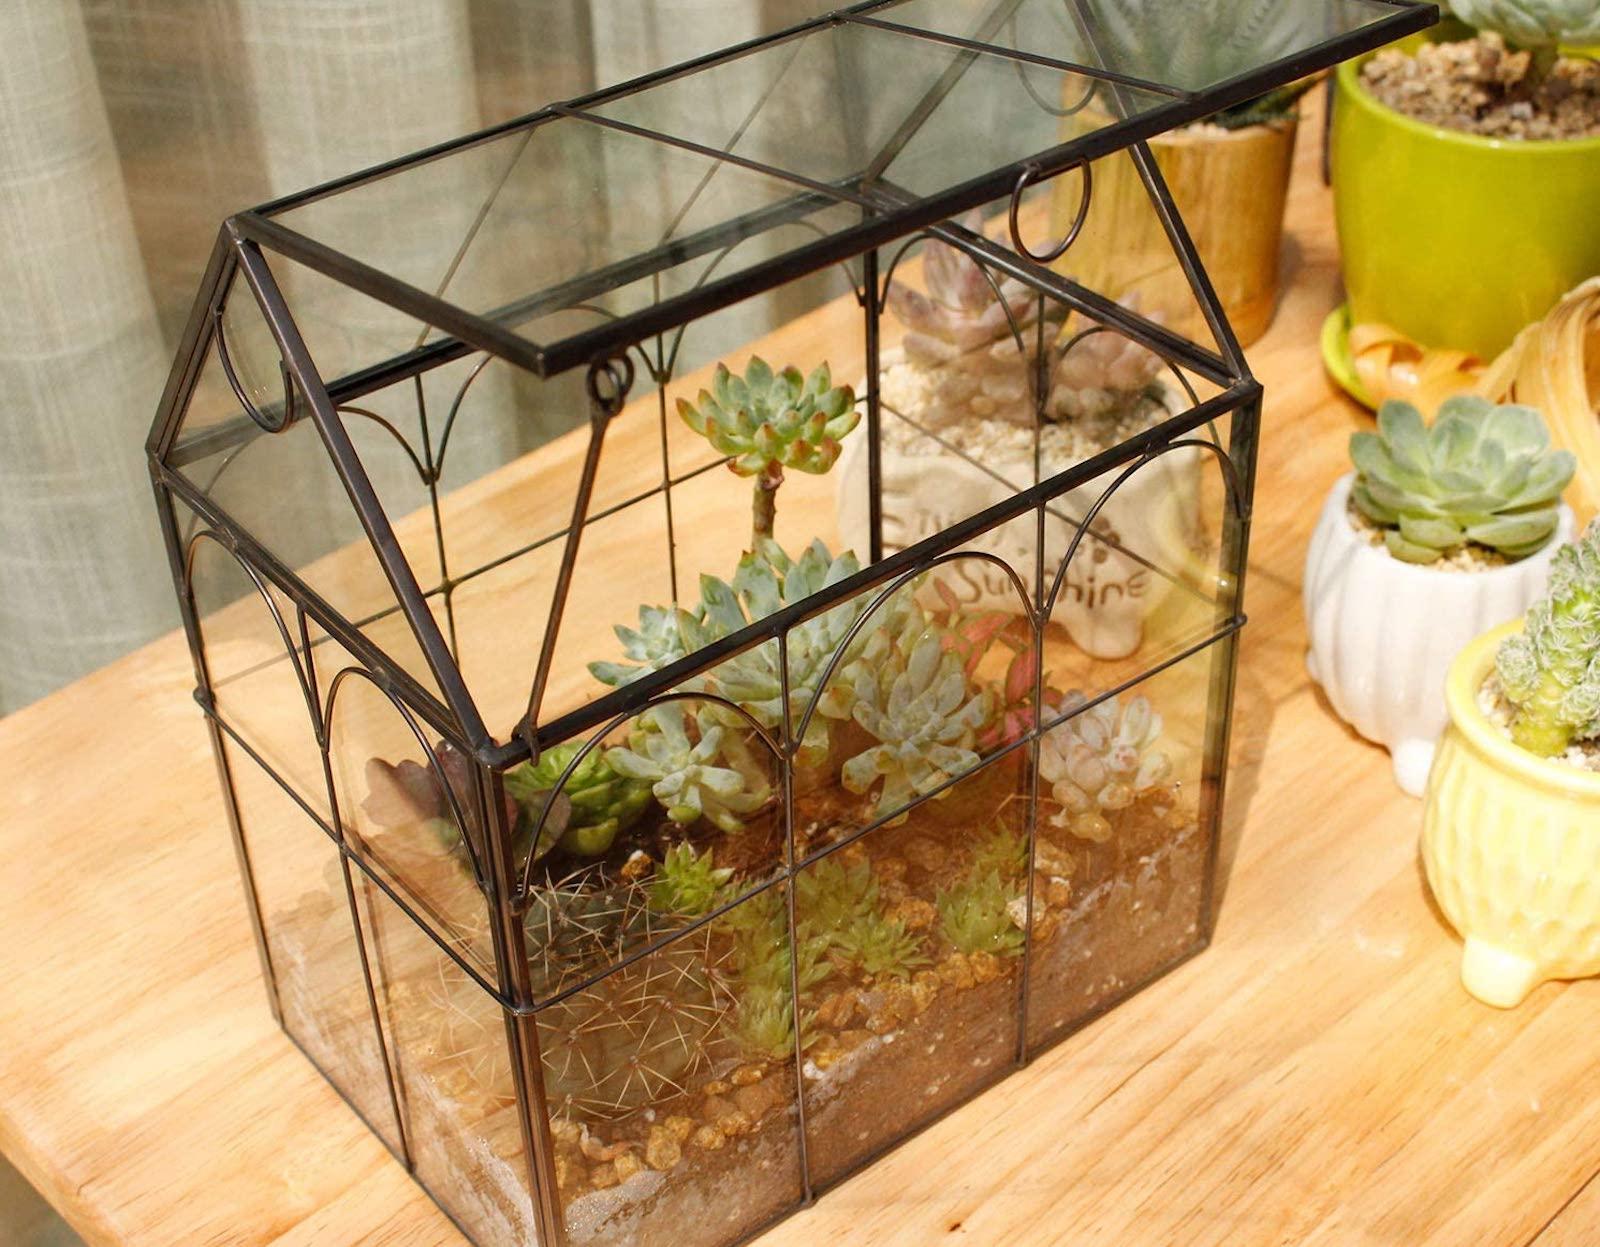 Metal terarium filled with succulents and cactus.